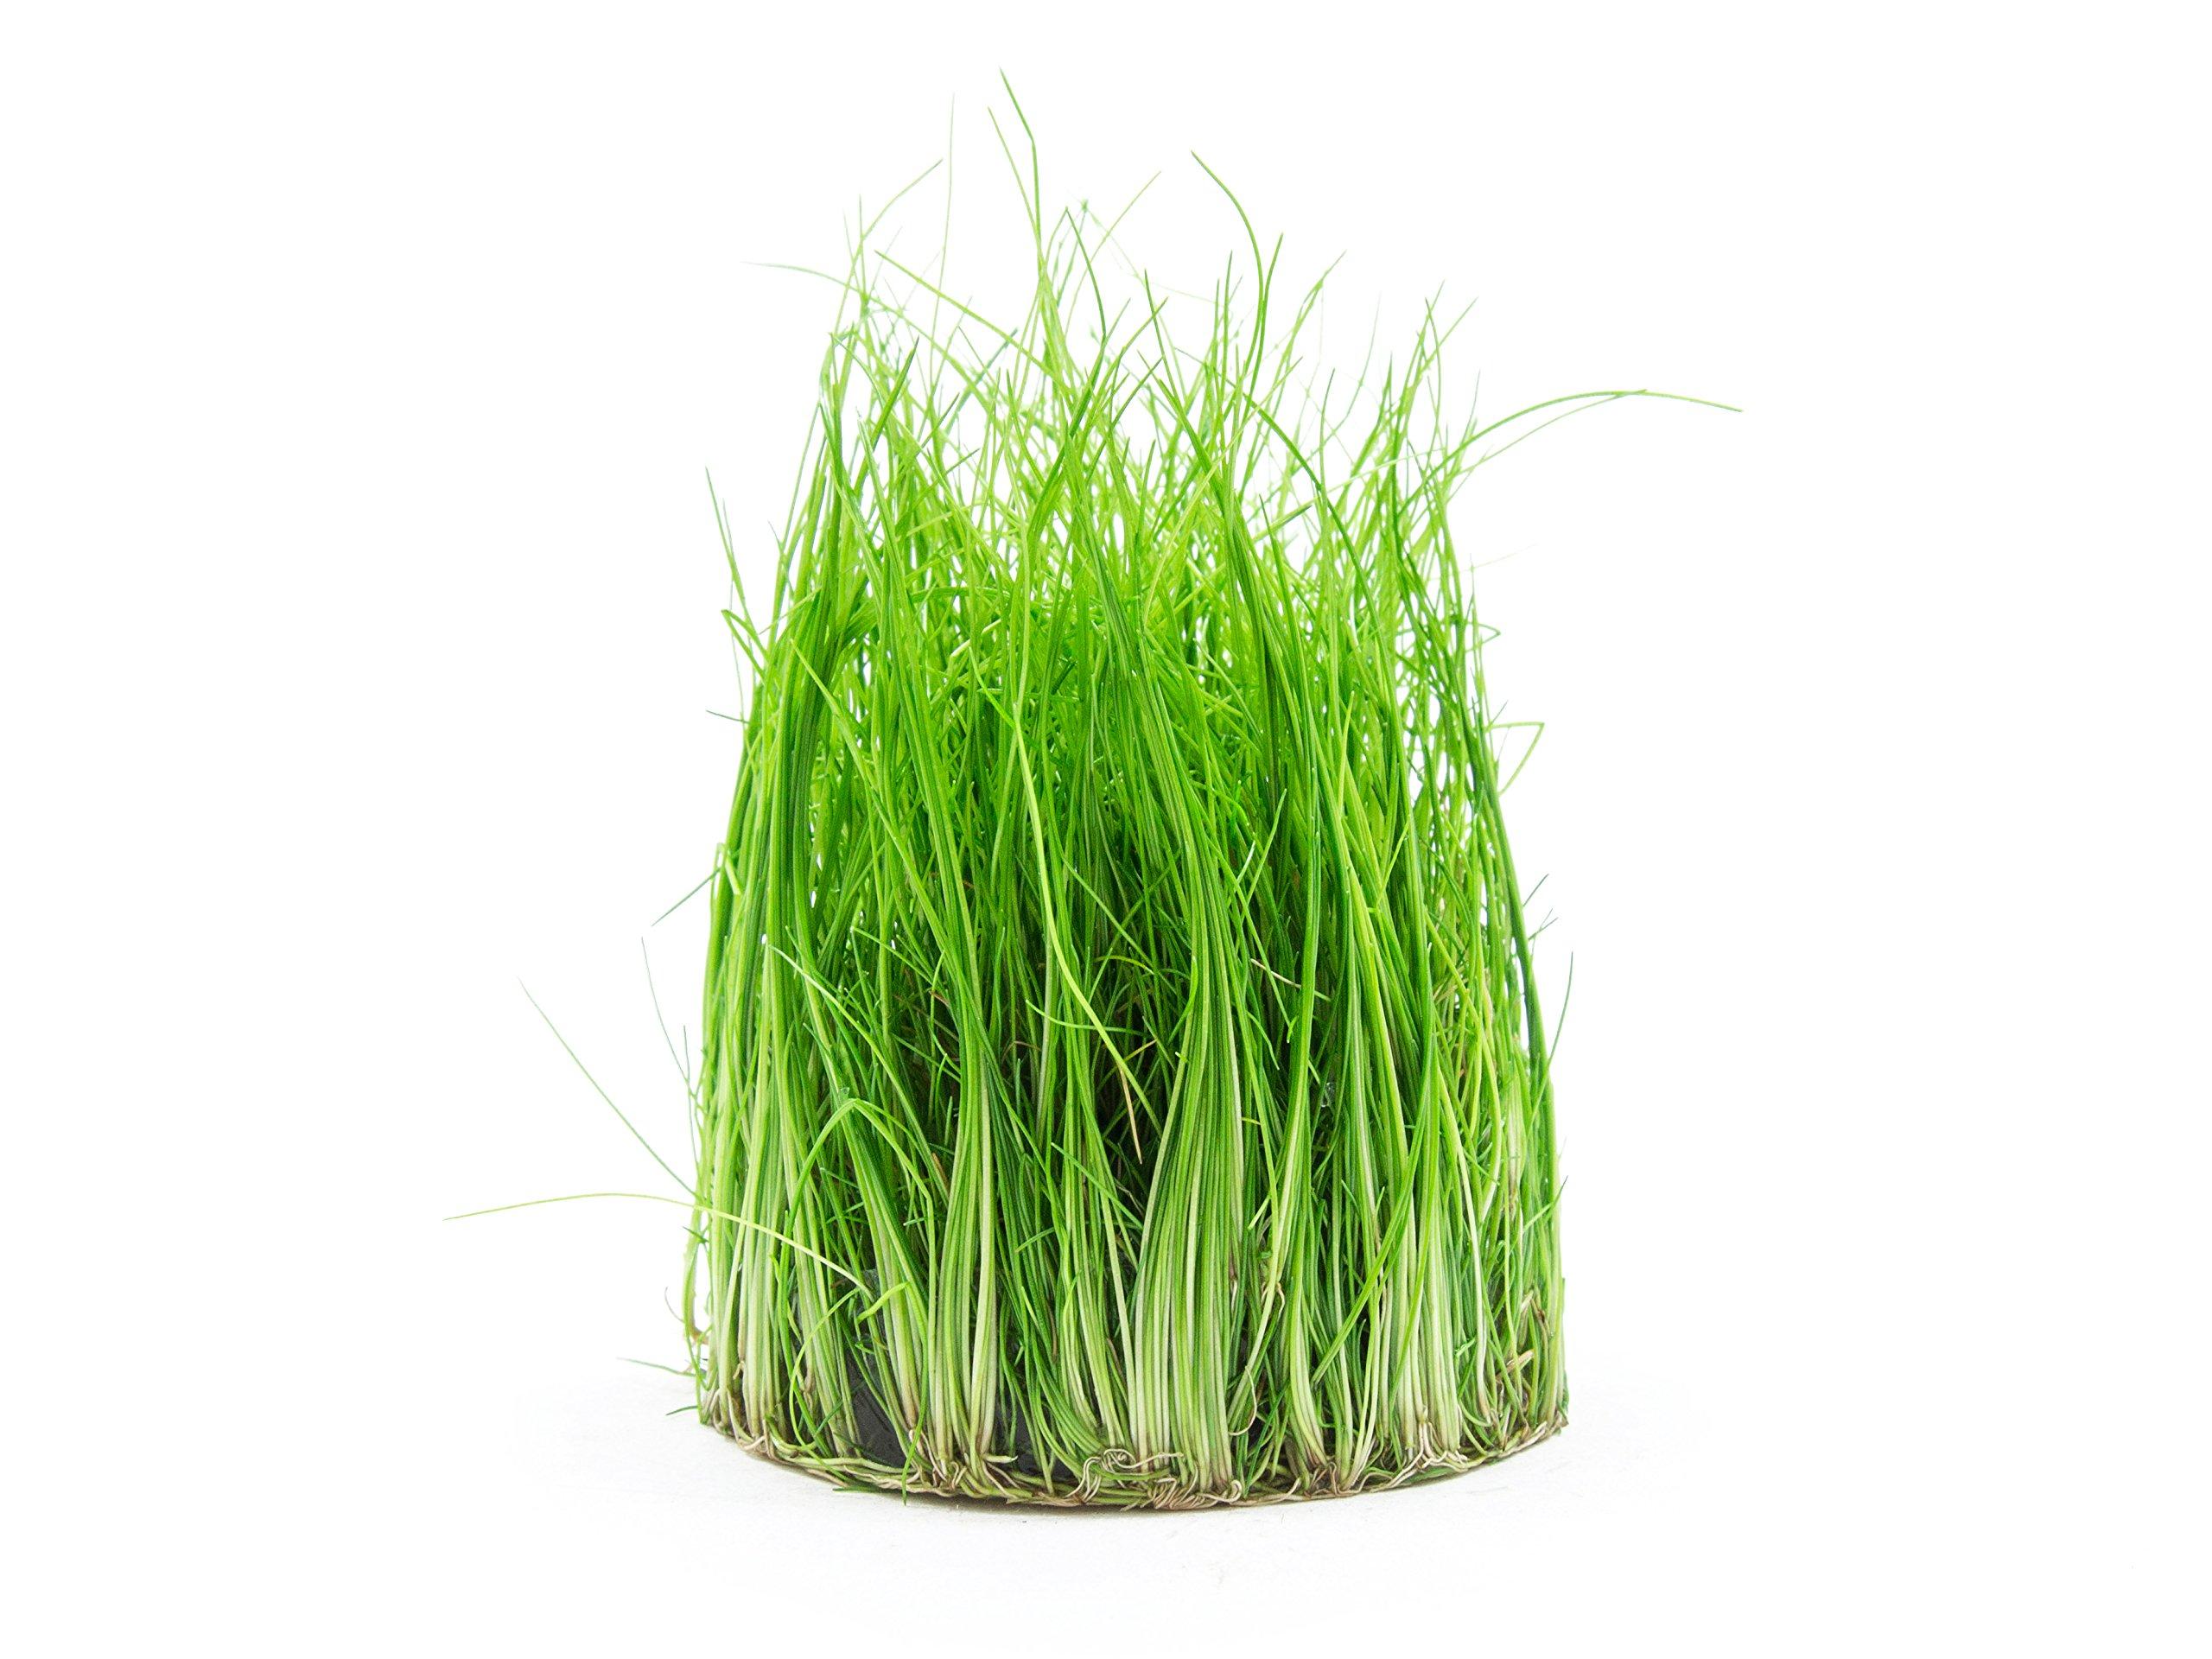 Aquatic Arts Dwarf Hairgrass Tissue Culture – Live Aquarium Plant by